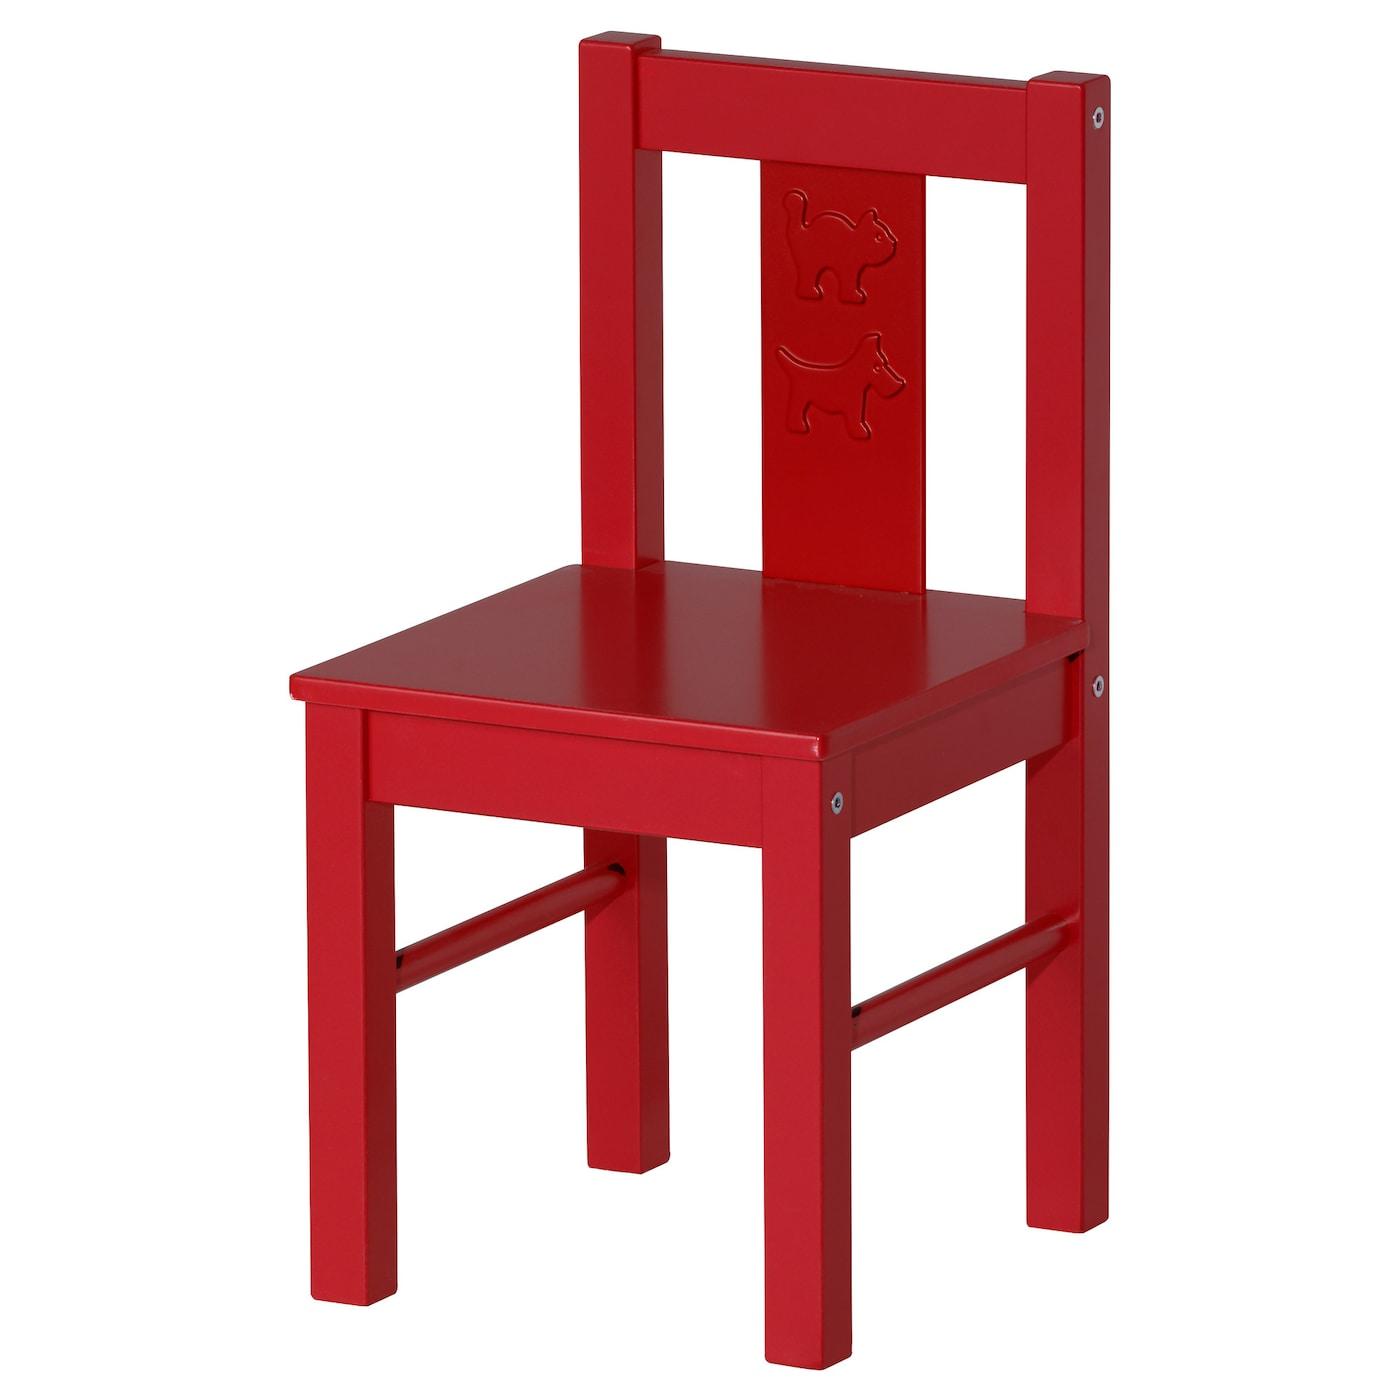 Kritter Silla Para Nino Rojo